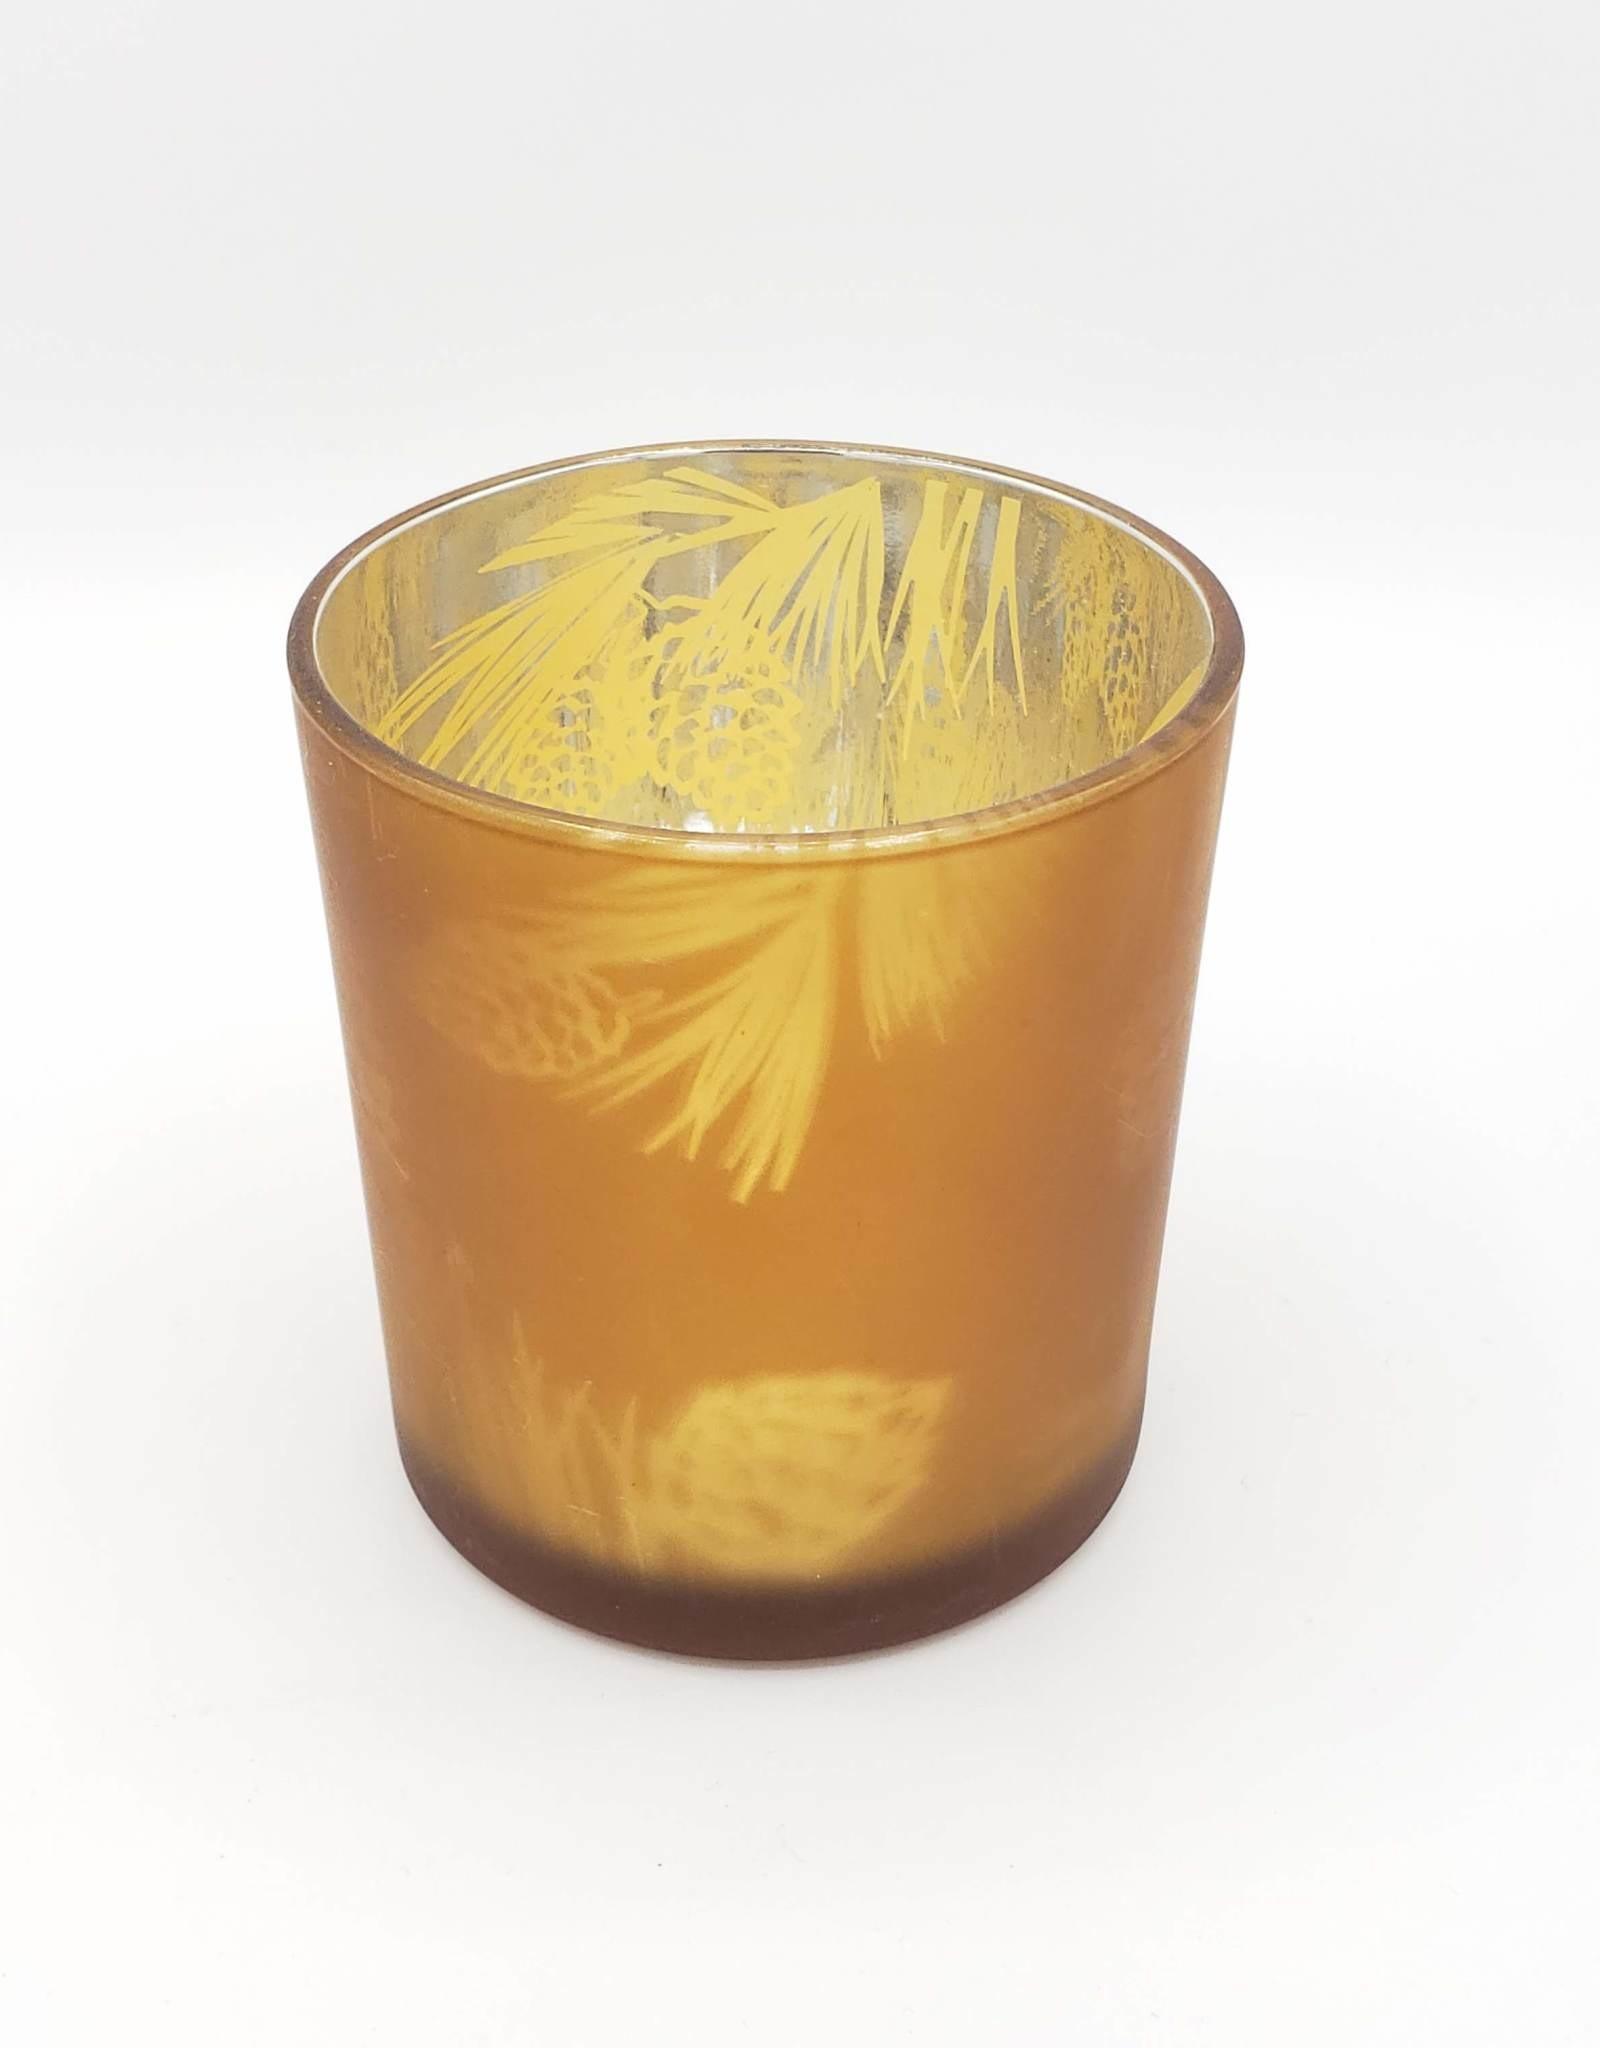 Pine Cone Votive Tea Light Holder, Amber Glass